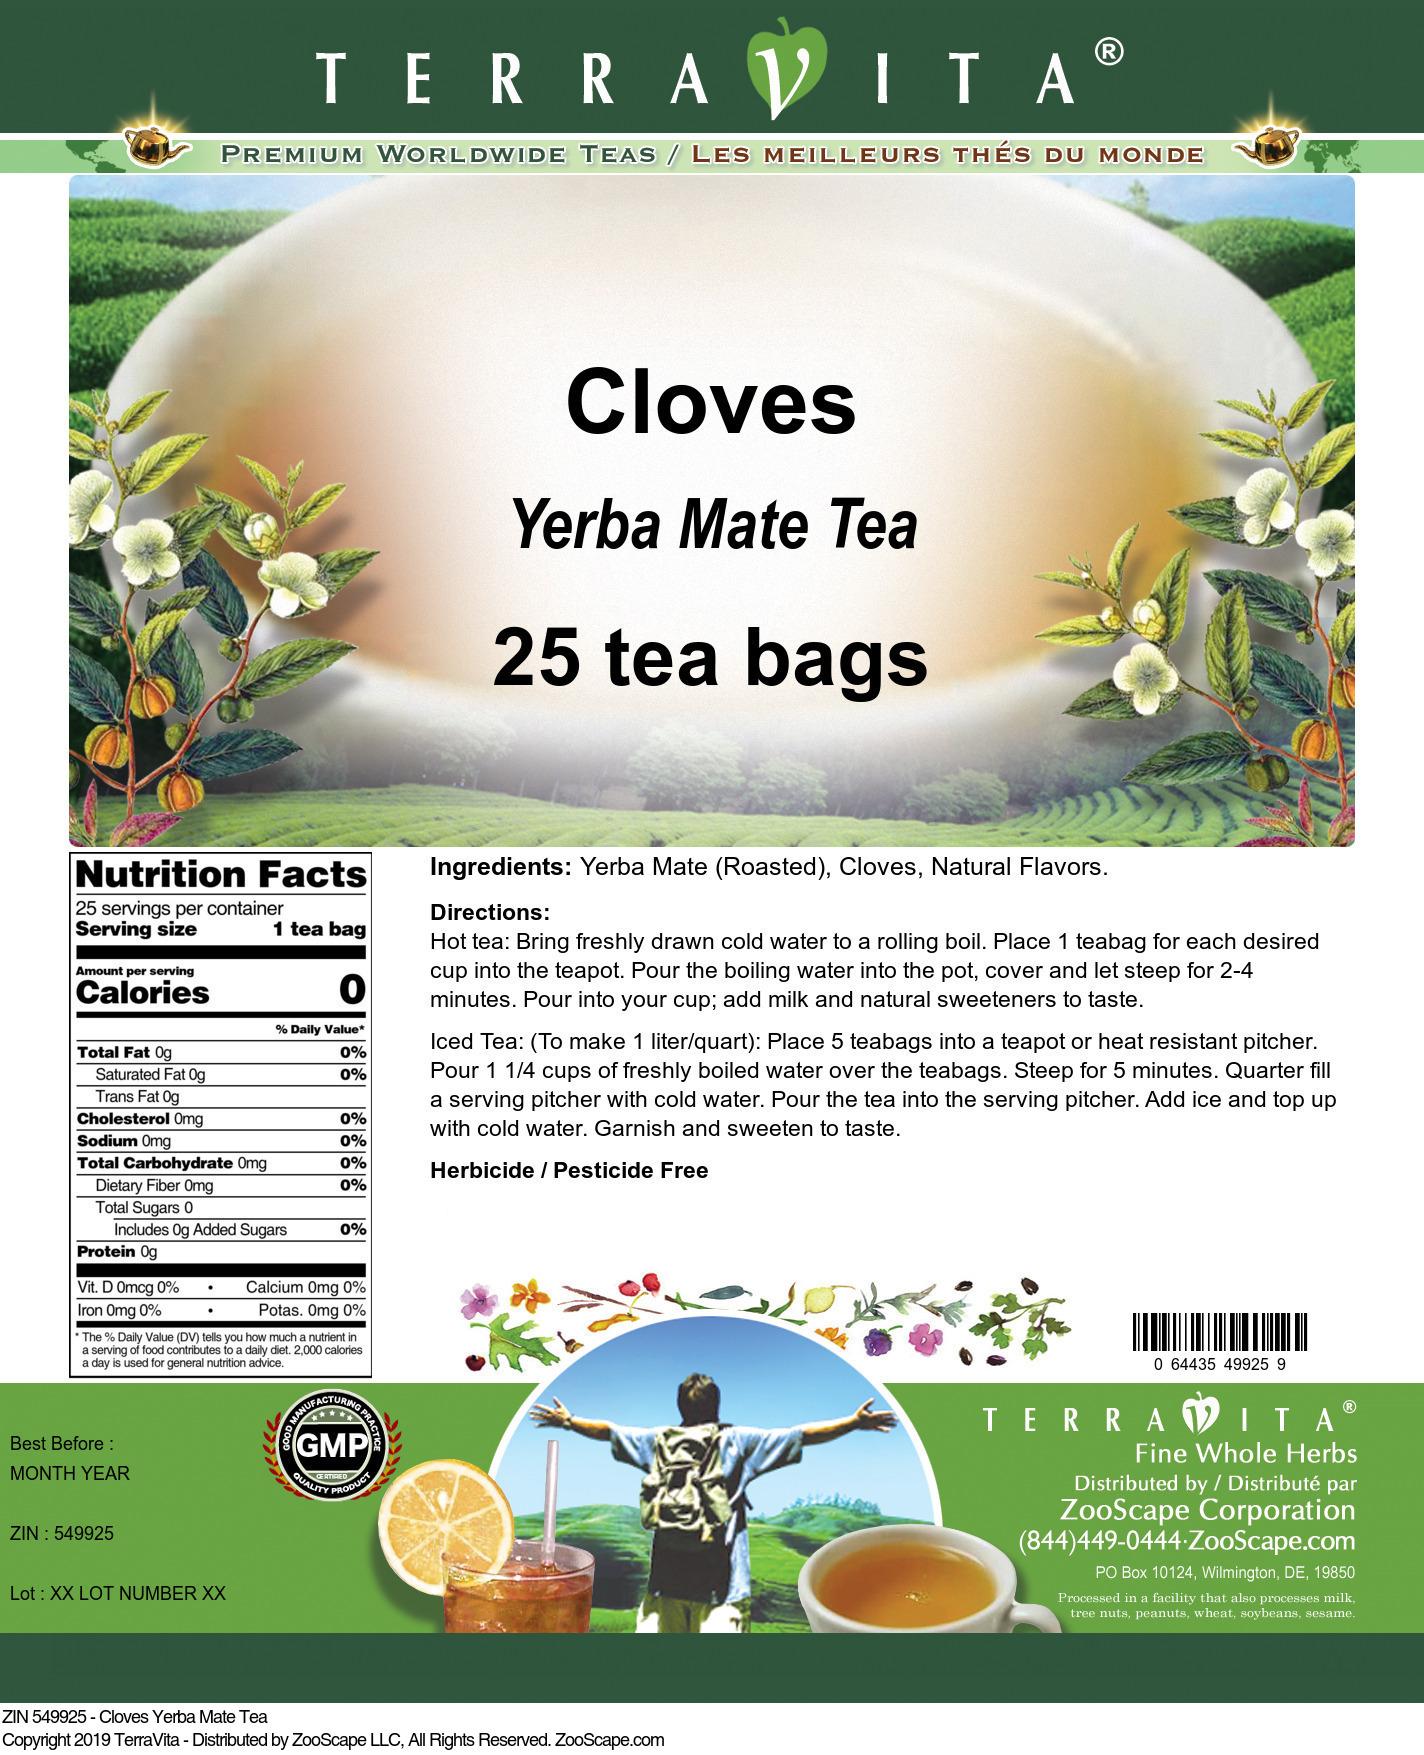 Cloves Yerba Mate Tea